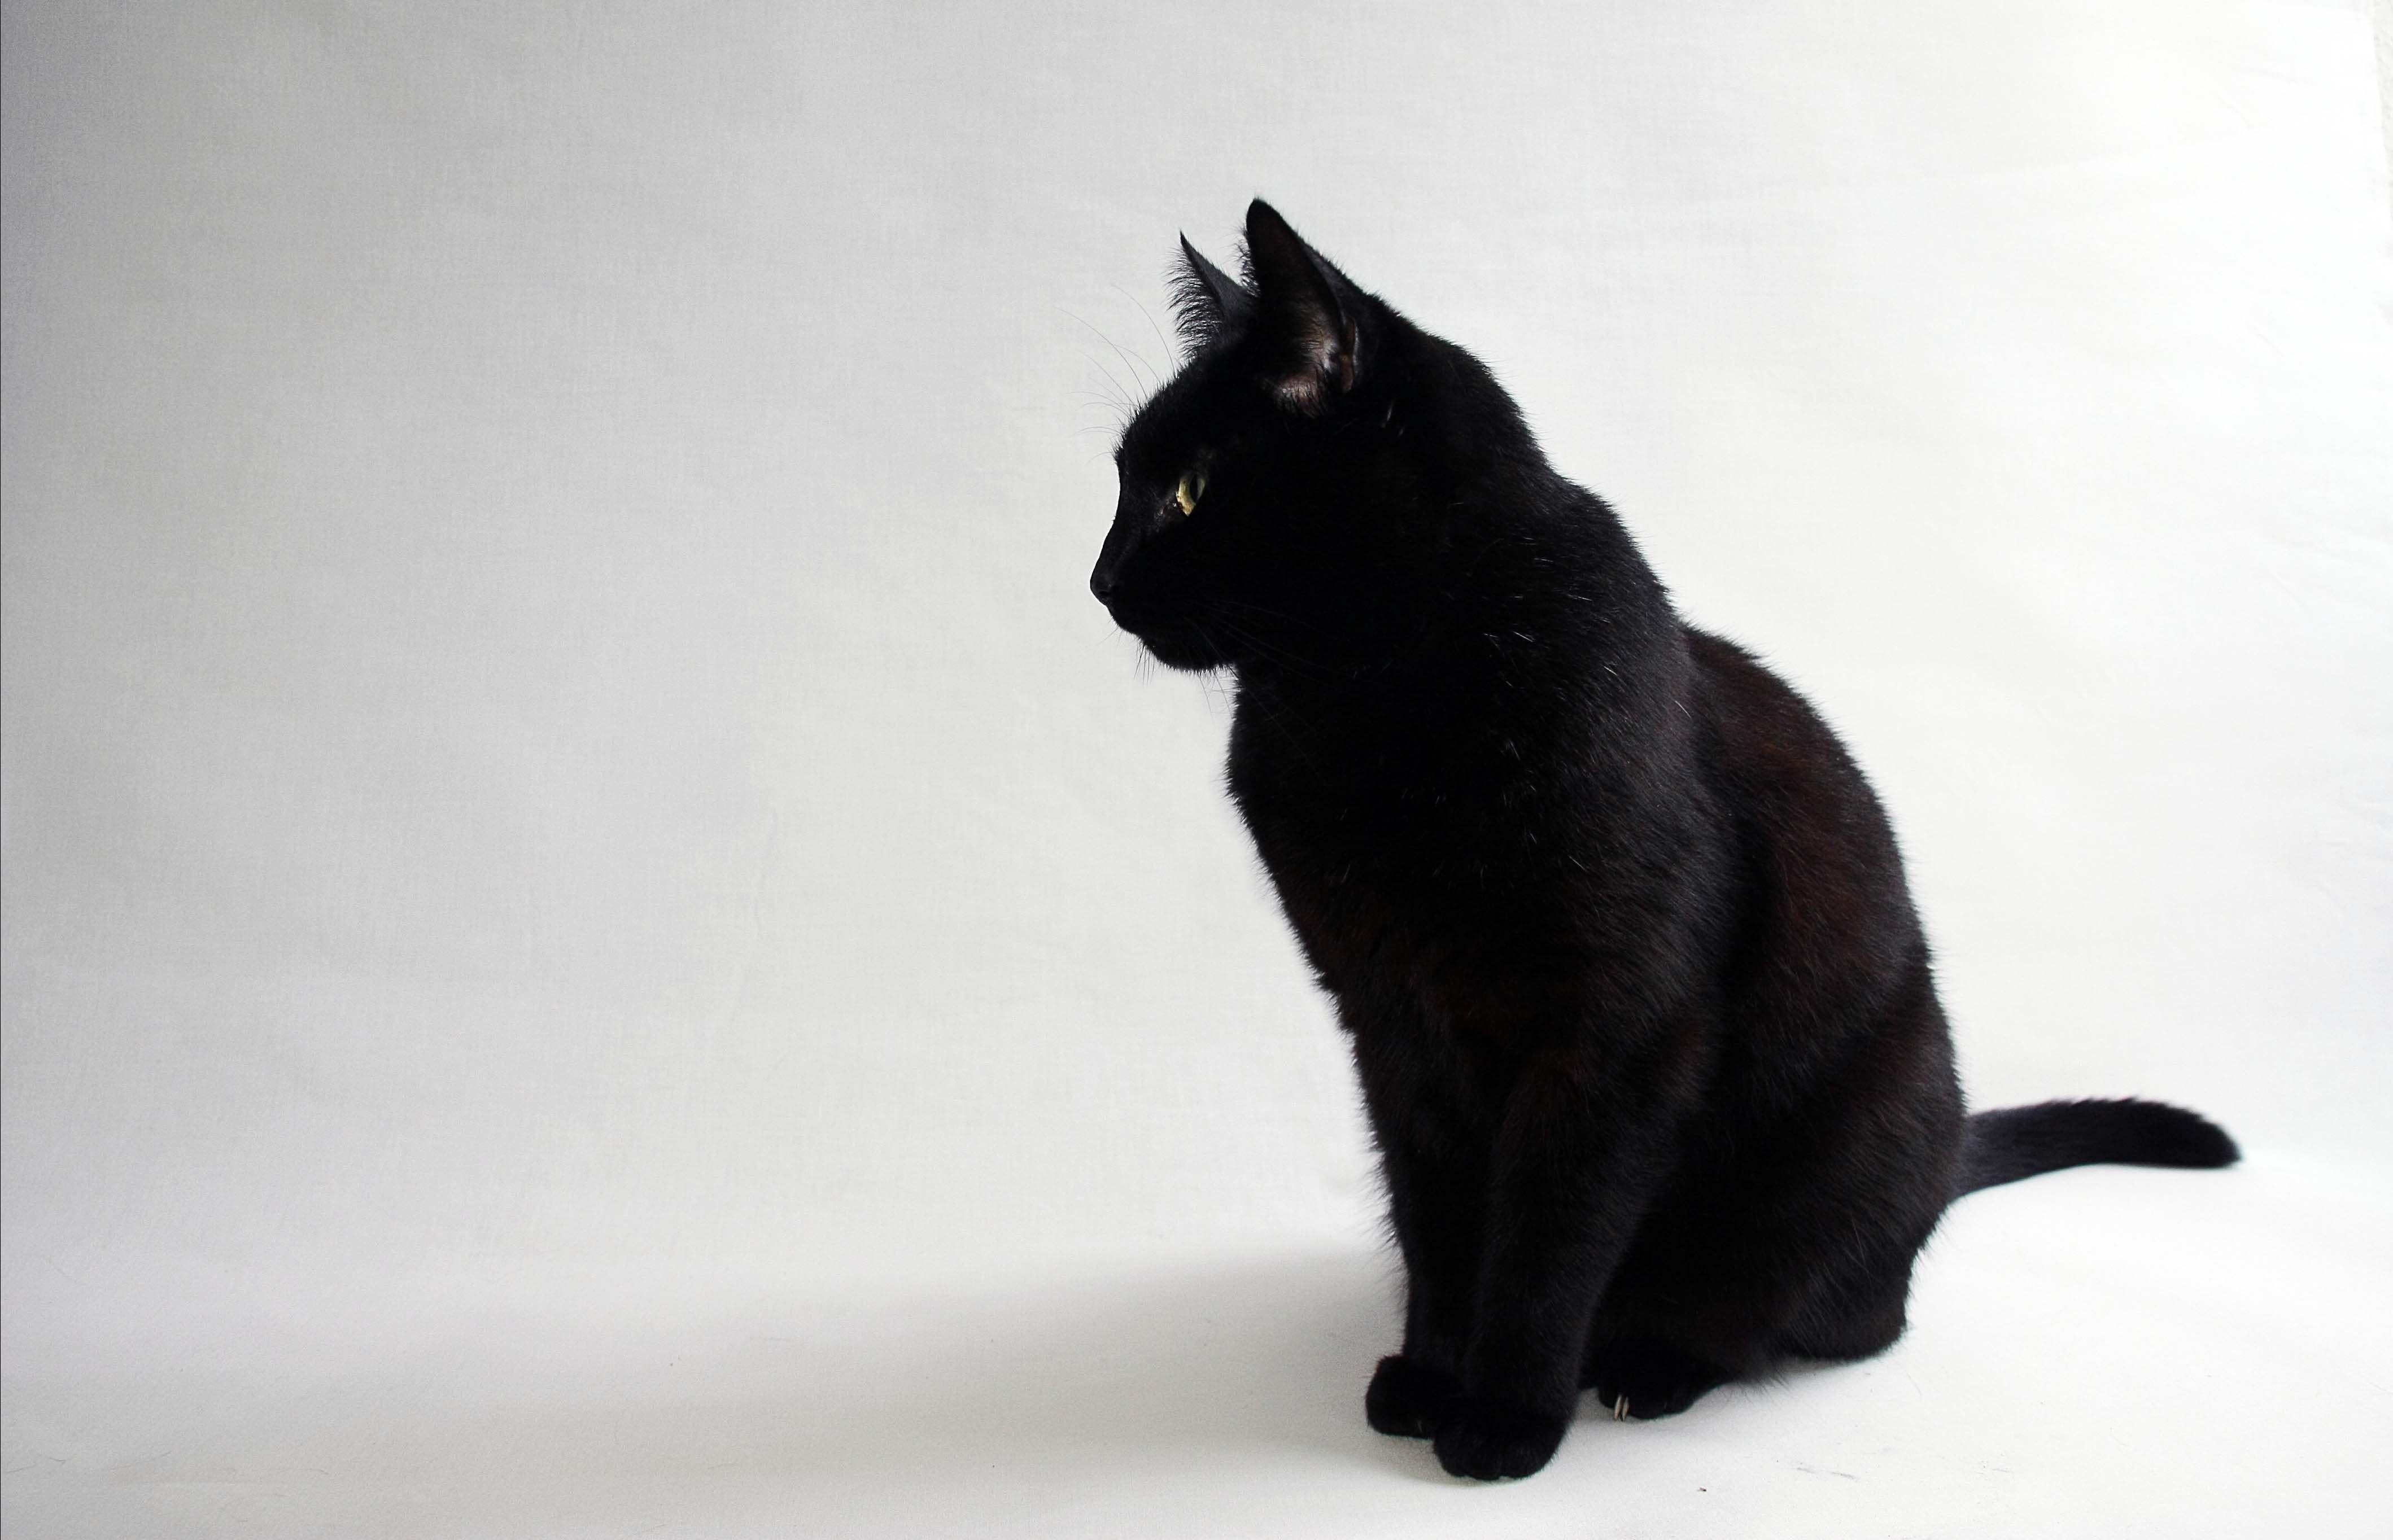 15 Enchanting Wallpapers Of Beautiful Black Cats Morewallpapers